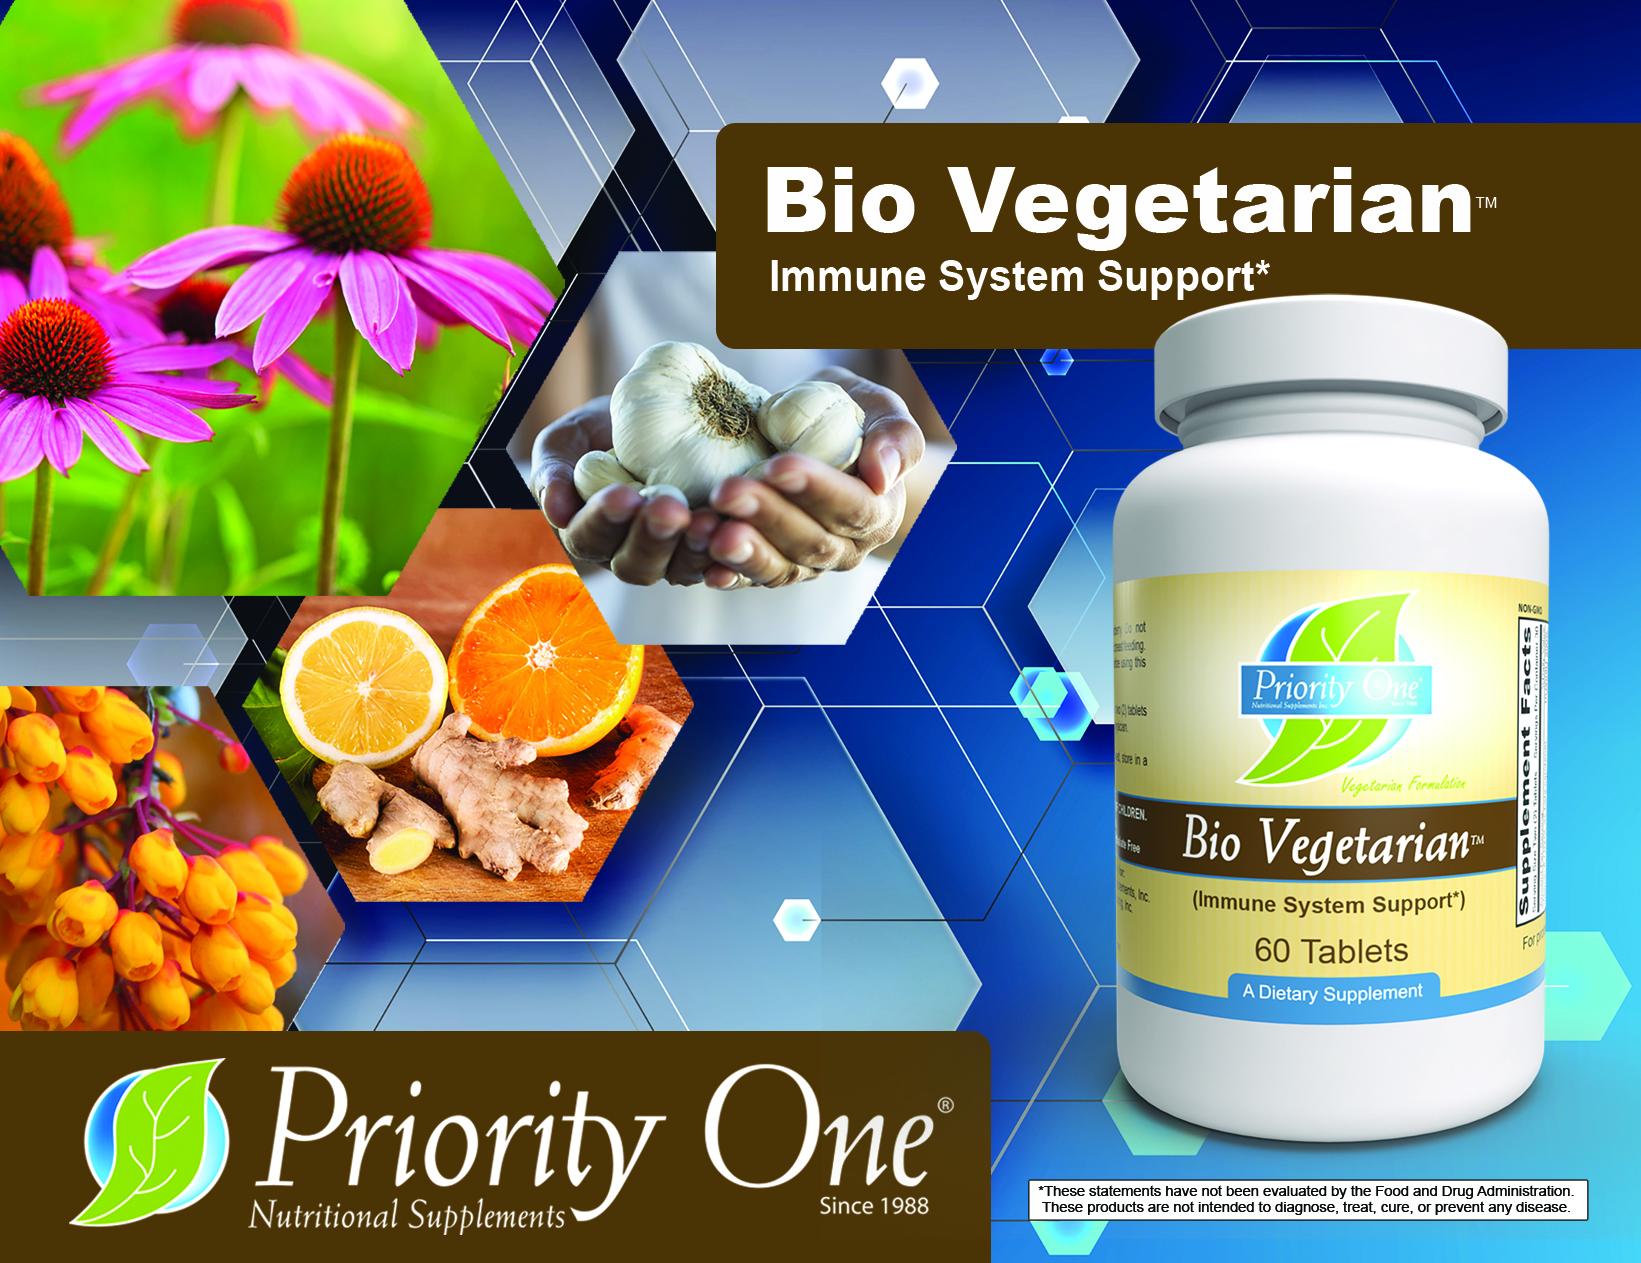 September Special – Bio Vegetarian at 20% off!